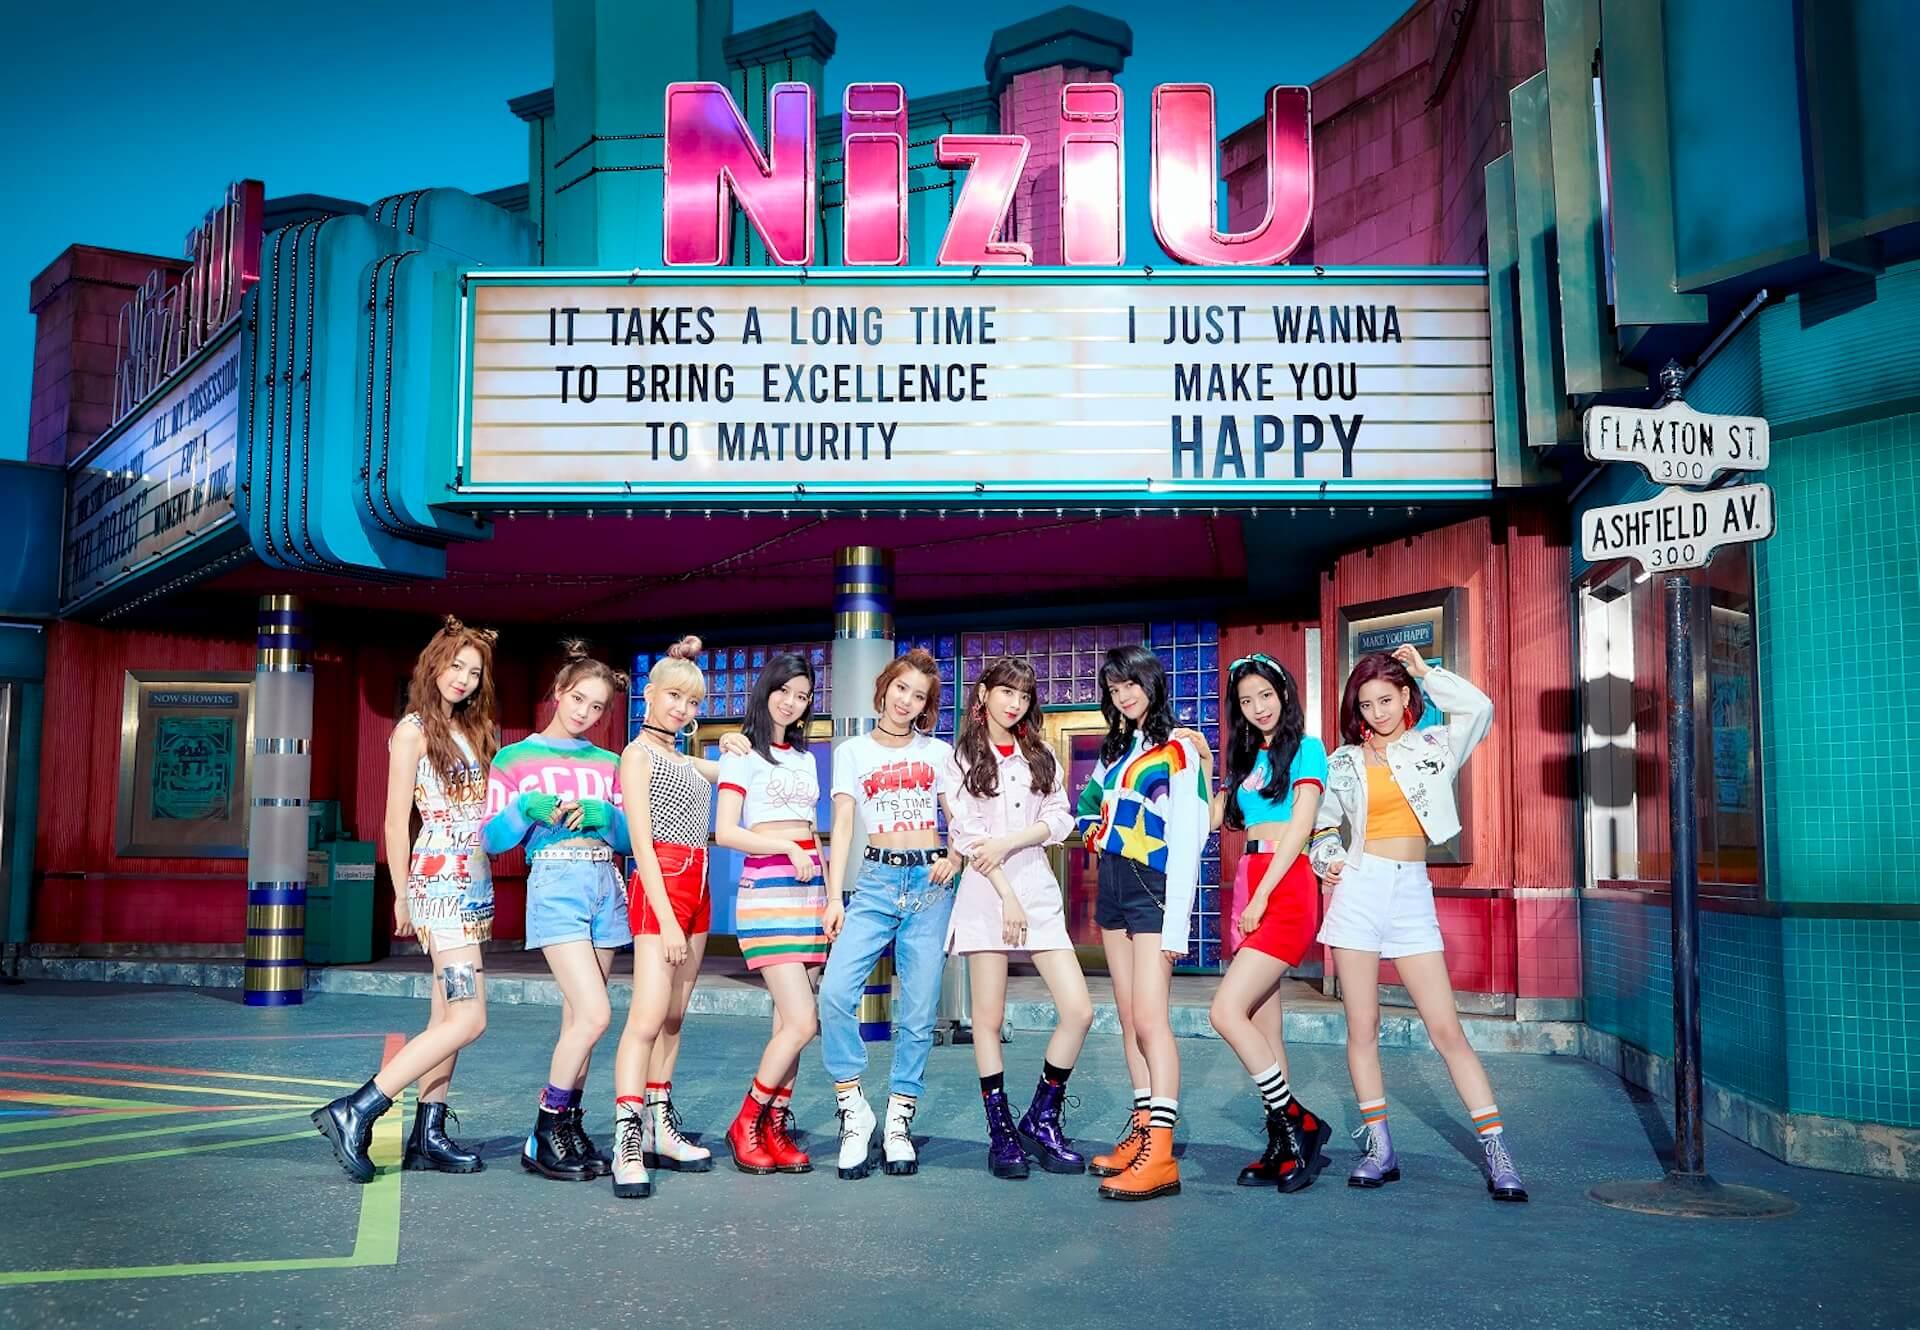 NiziU、プレデビューアルバム『Make you happy』&MVを初解禁!ファンクラブ「WithU」も明日始動 music200630_niziu_6